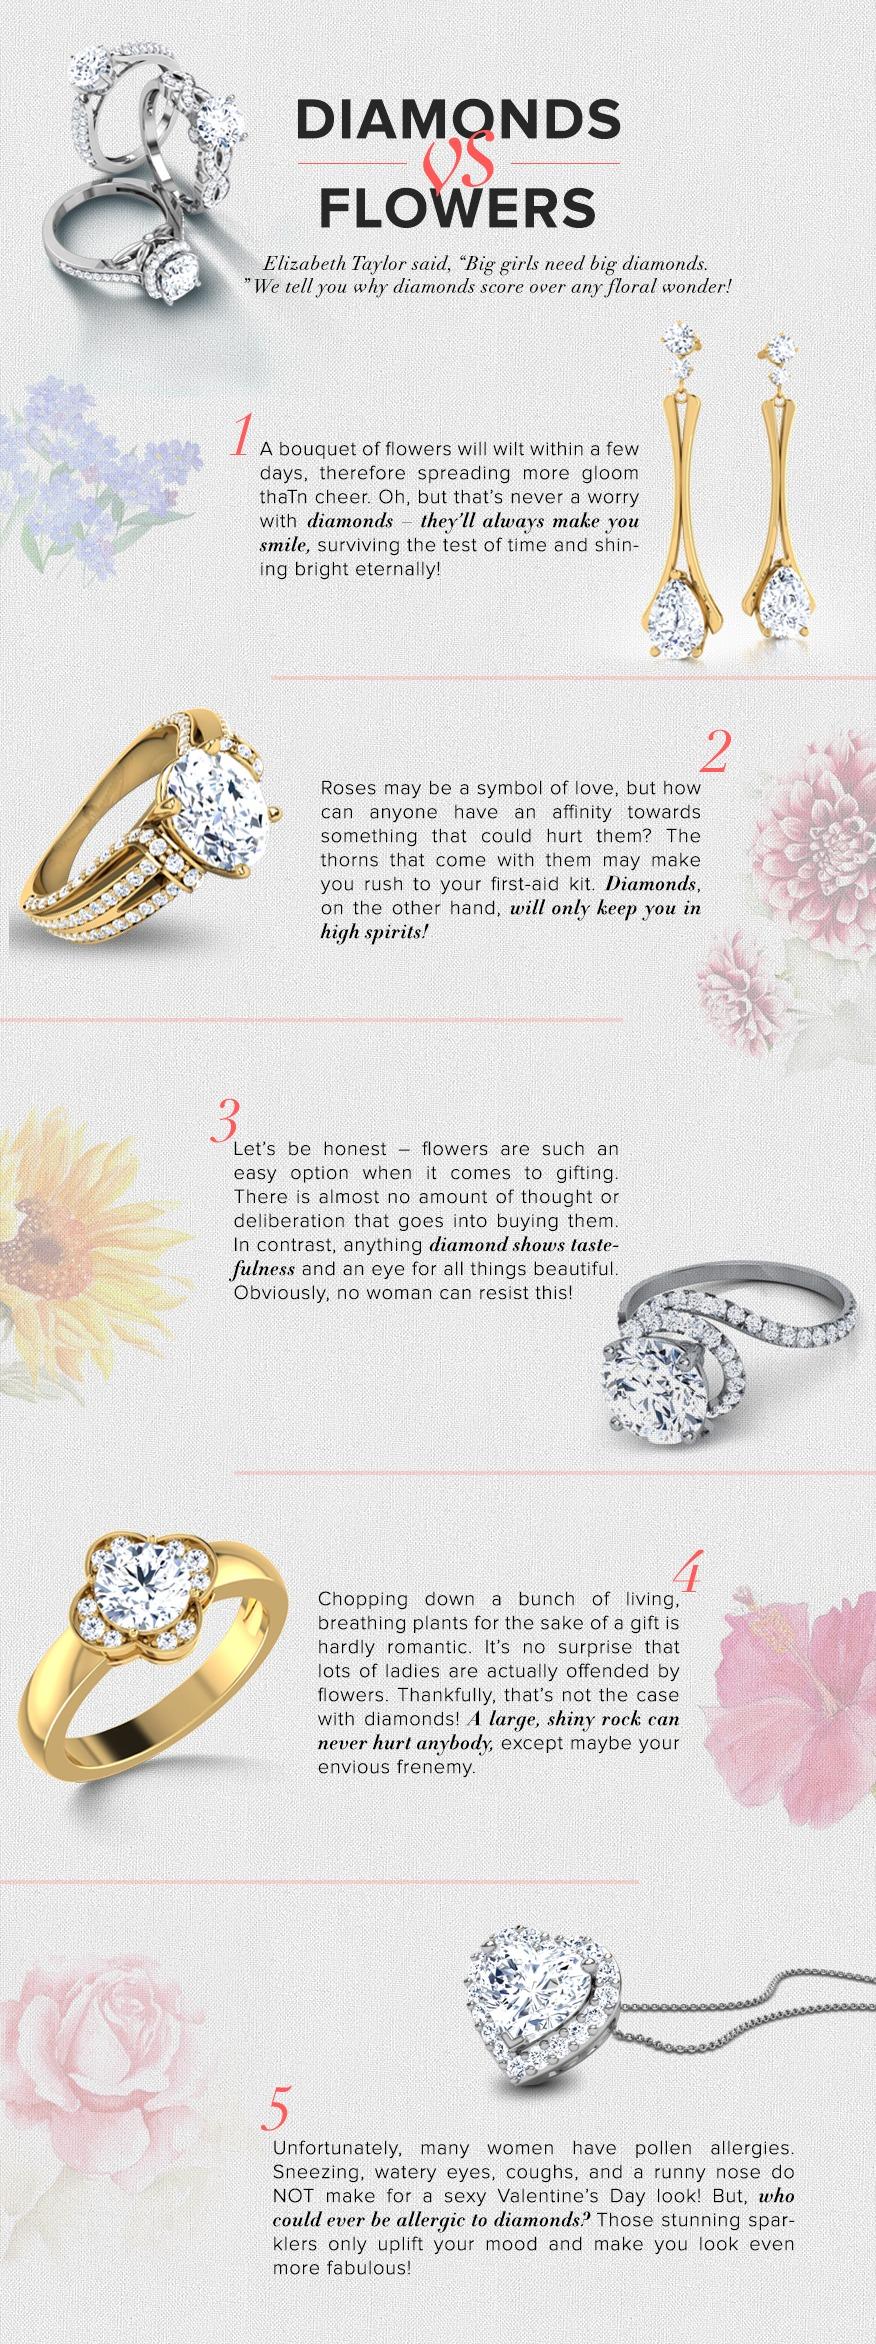 V-DAY EDITION: DIAMONDS VS. DAISIES?